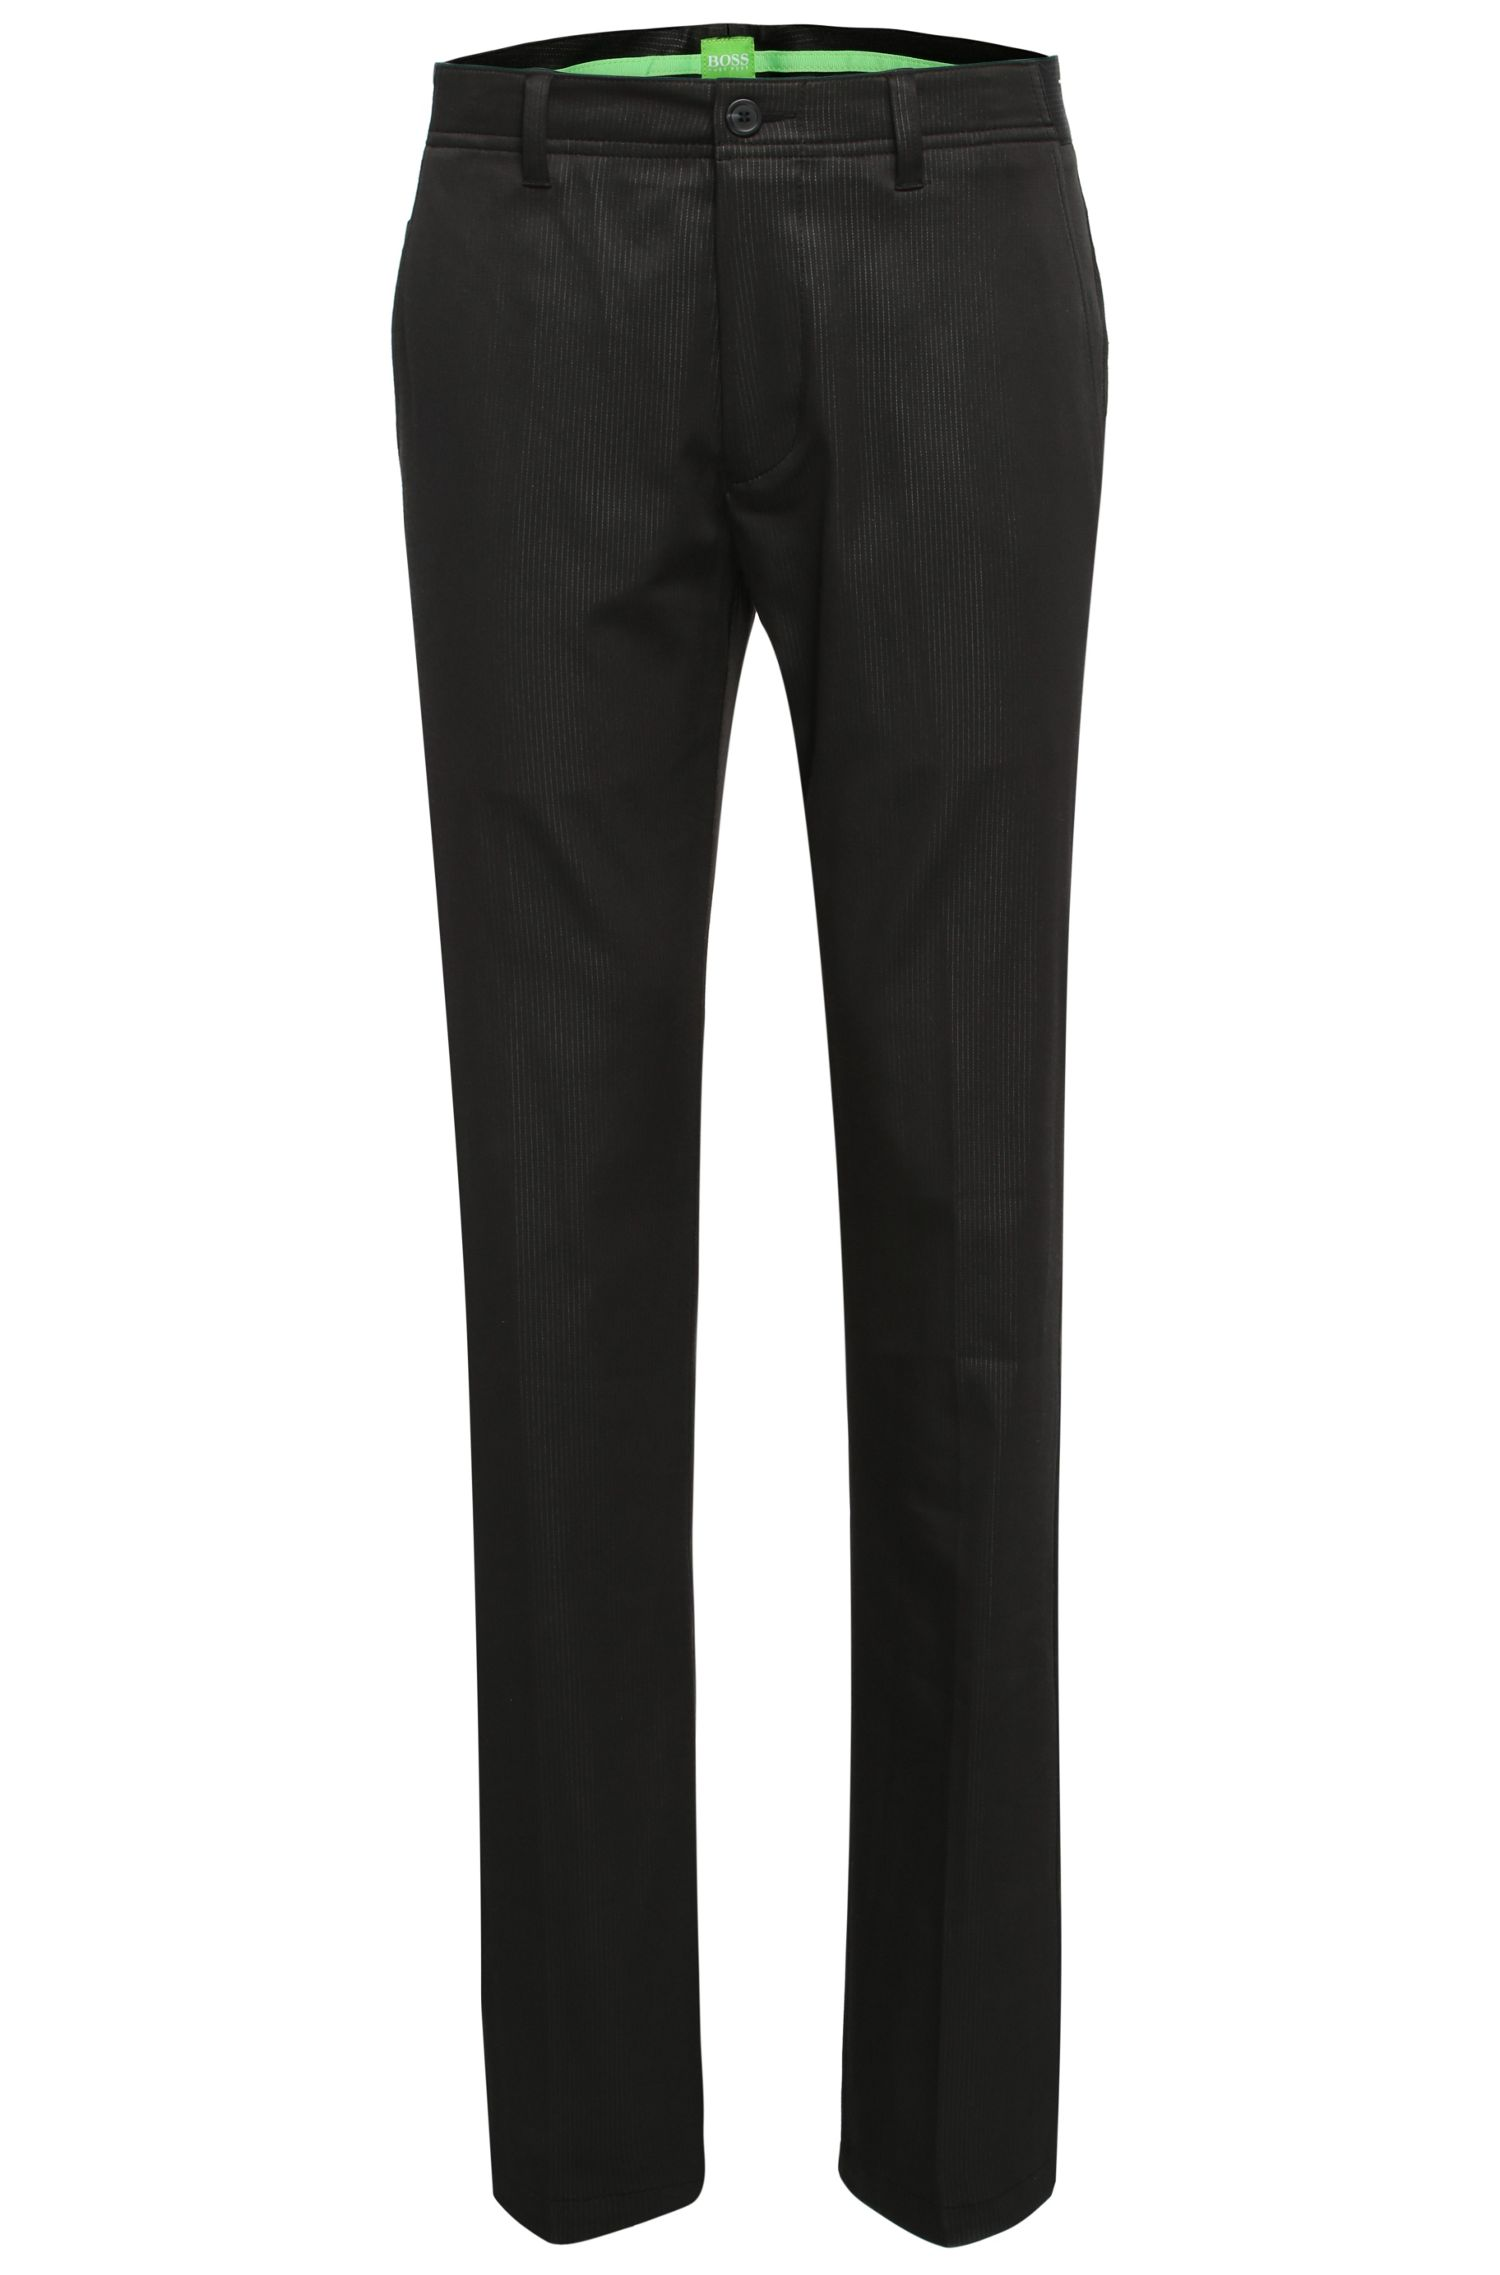 'Hakan' | Slim Fit, CoolMax Performance Golf Pants